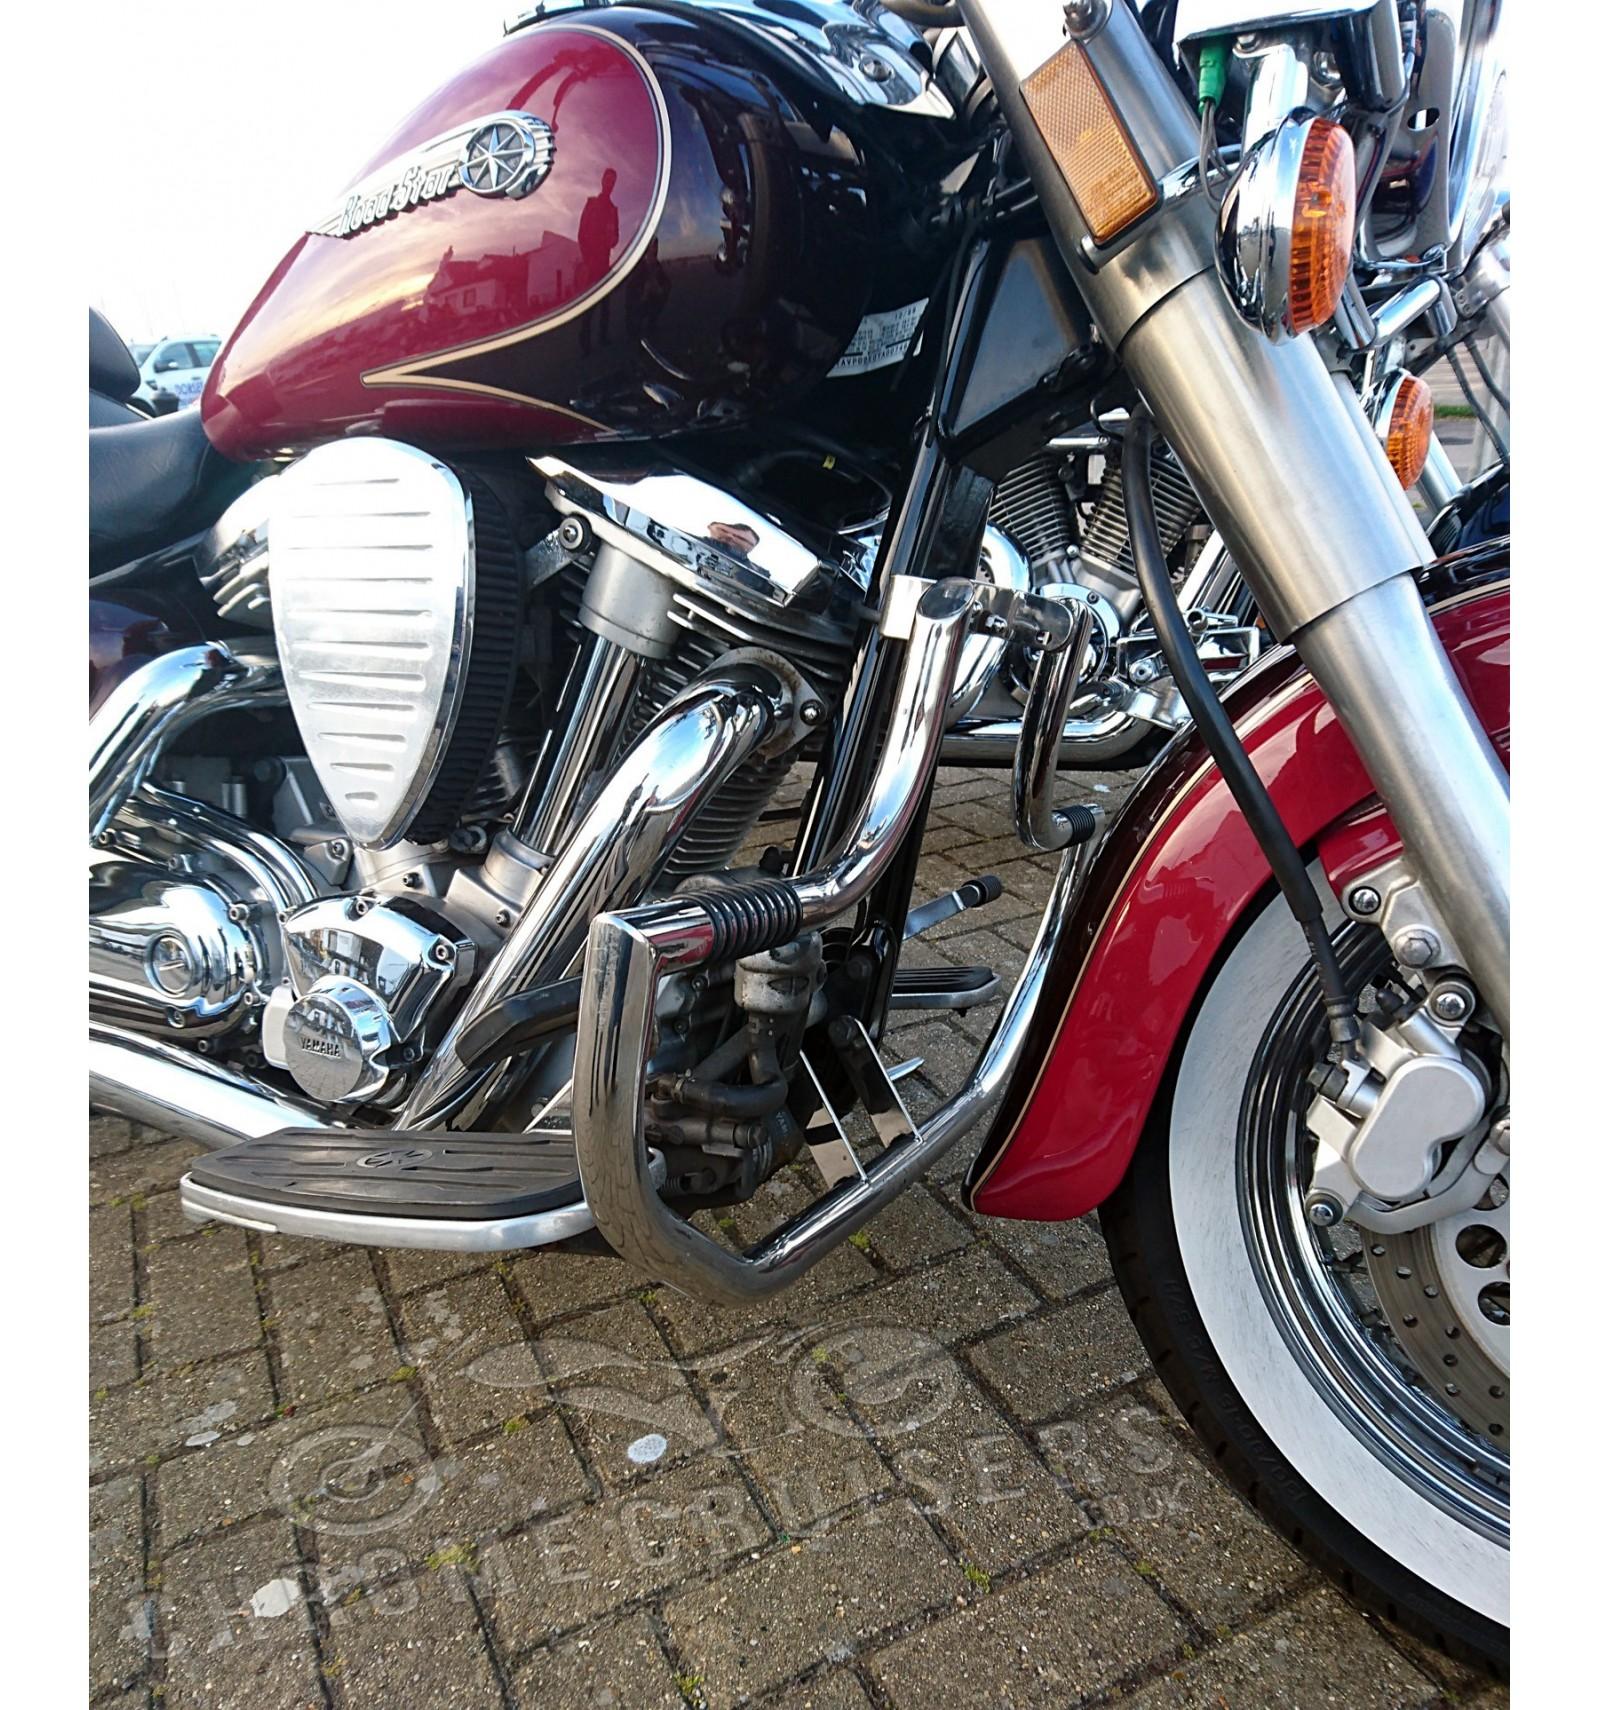 Sissy Bar//Backrest for Yamaha Road Star XV 1600 Road Star XV 1700